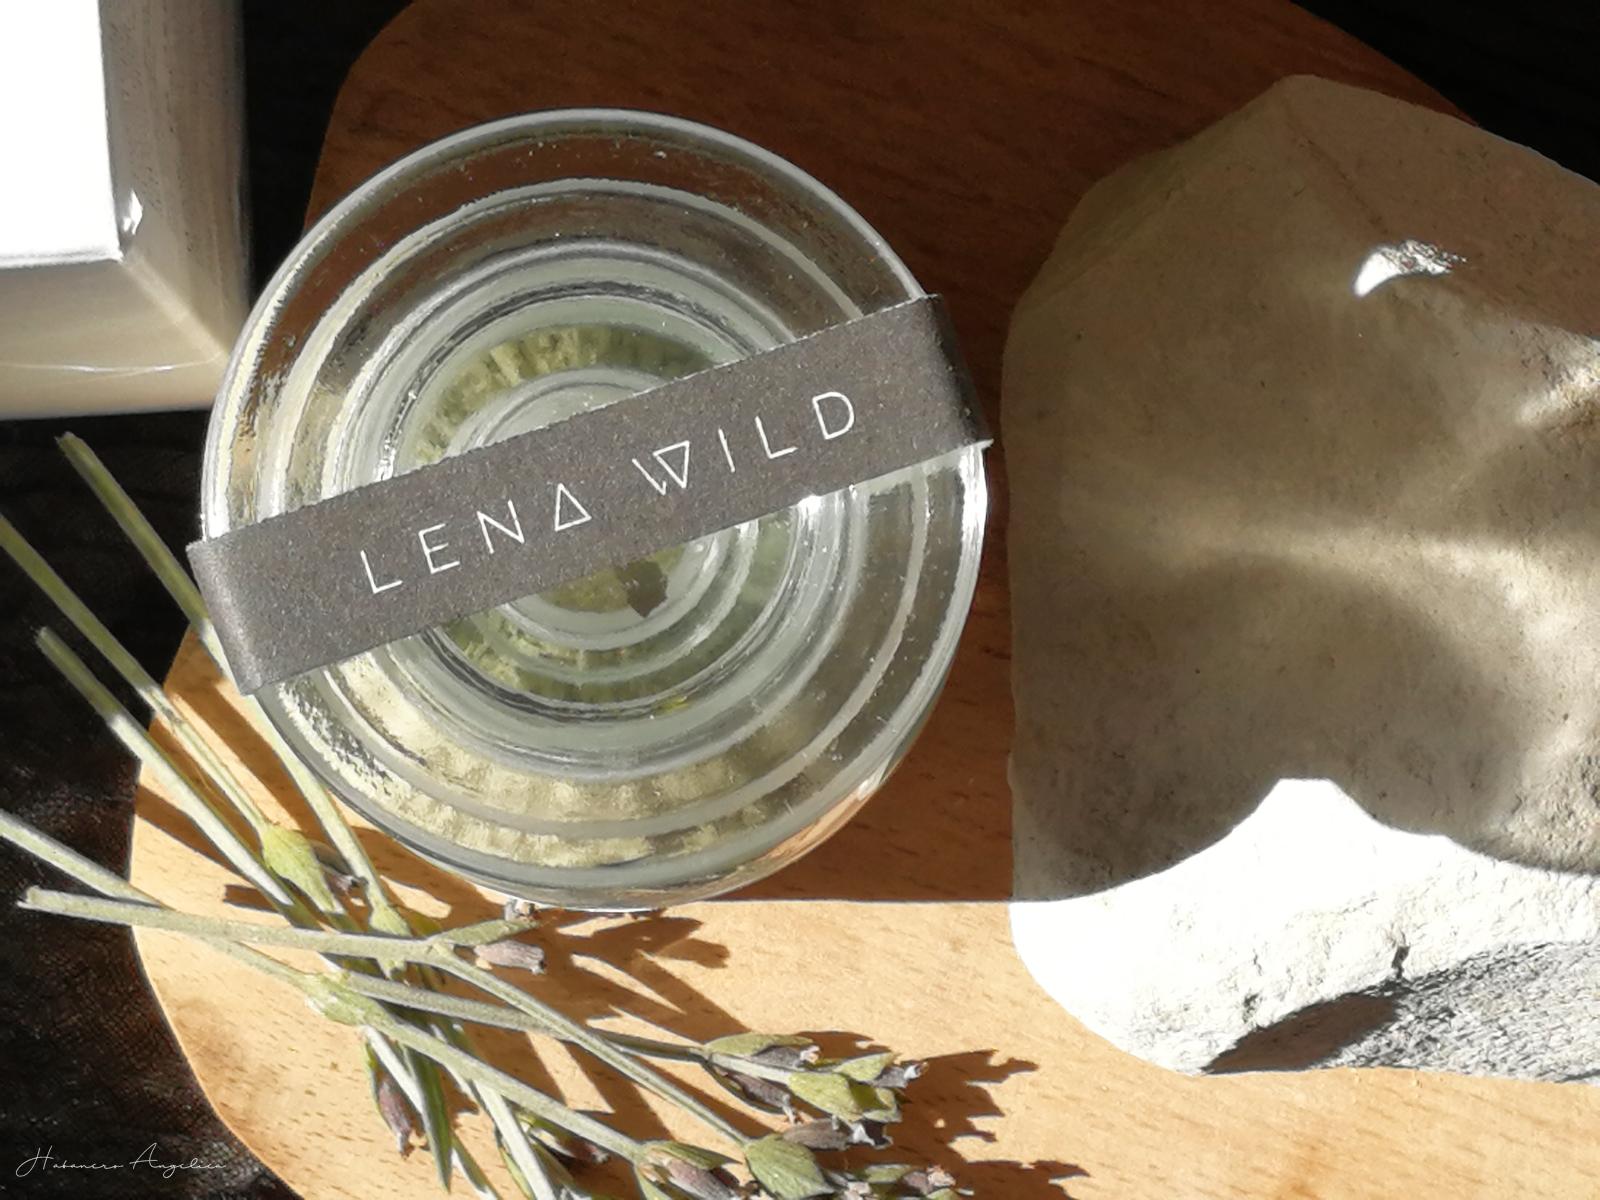 Lena wild maschera viso